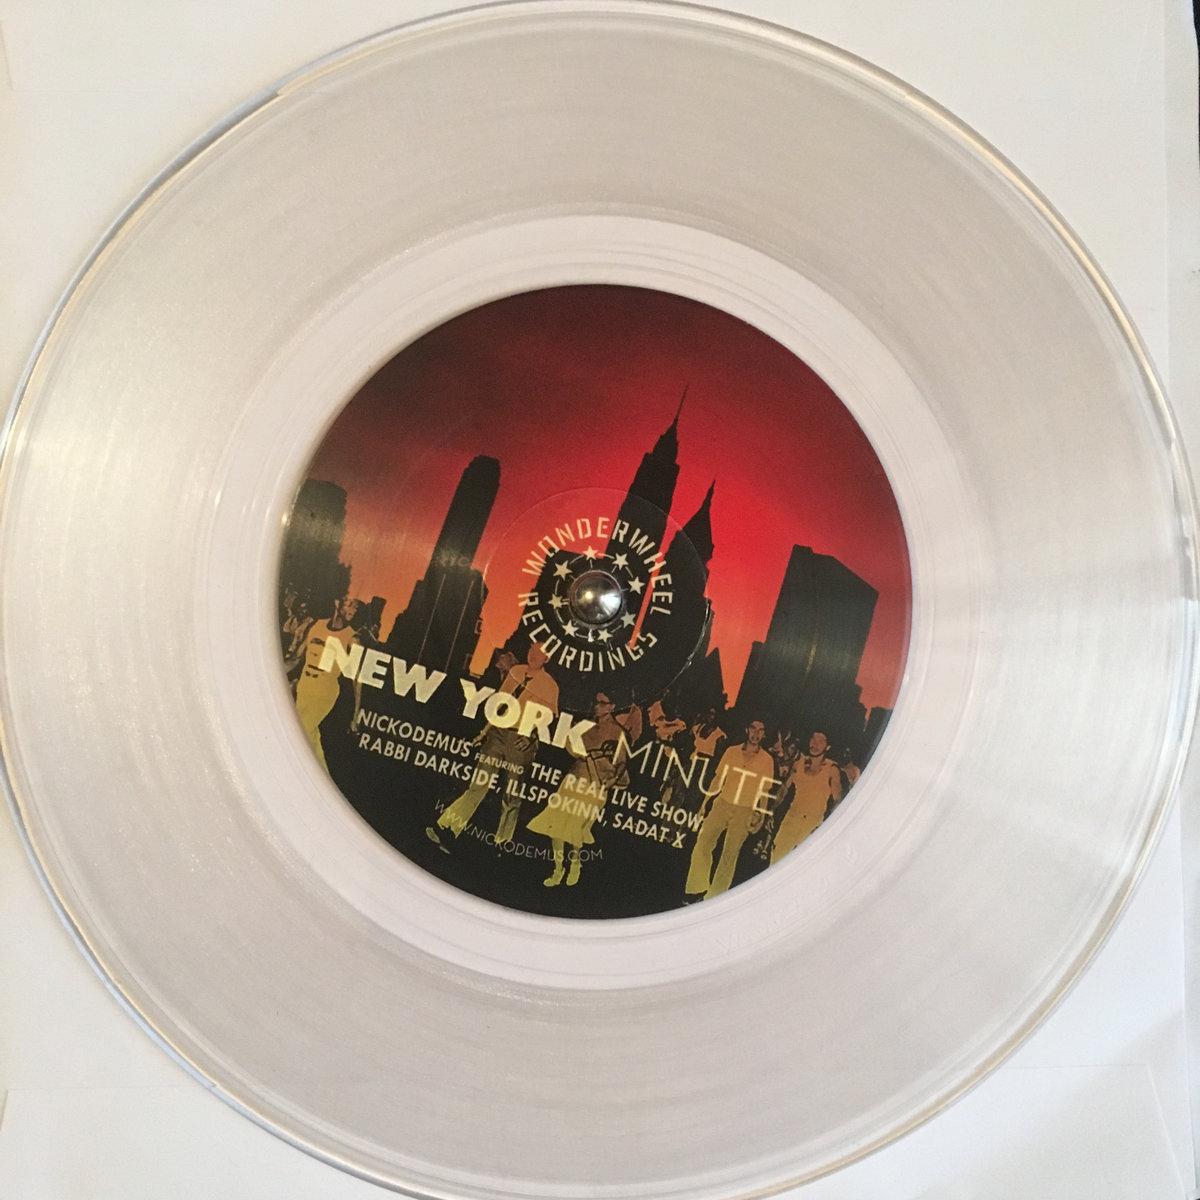 A NEW YORK MINUTE (Barrio Bump instrumental) | Wonderwheel Recordings